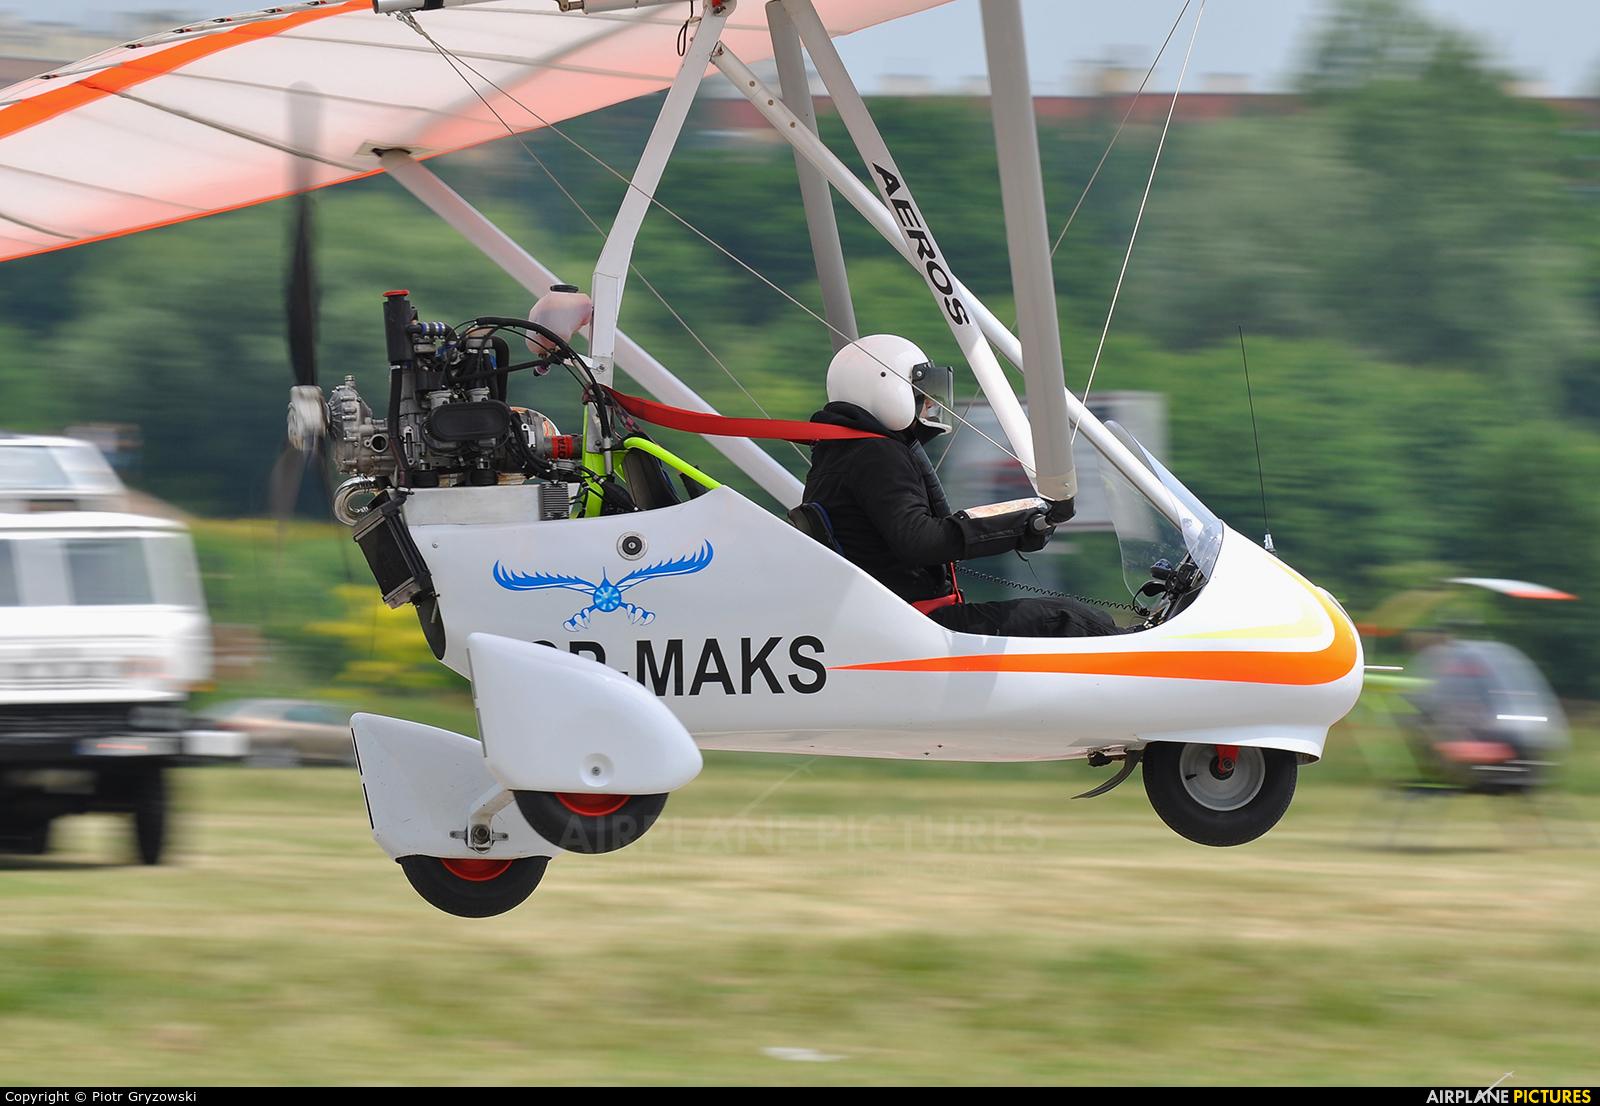 Private SP-MAKS aircraft at Kraków, Rakowice Czyżyny - Museum of Polish Aviation